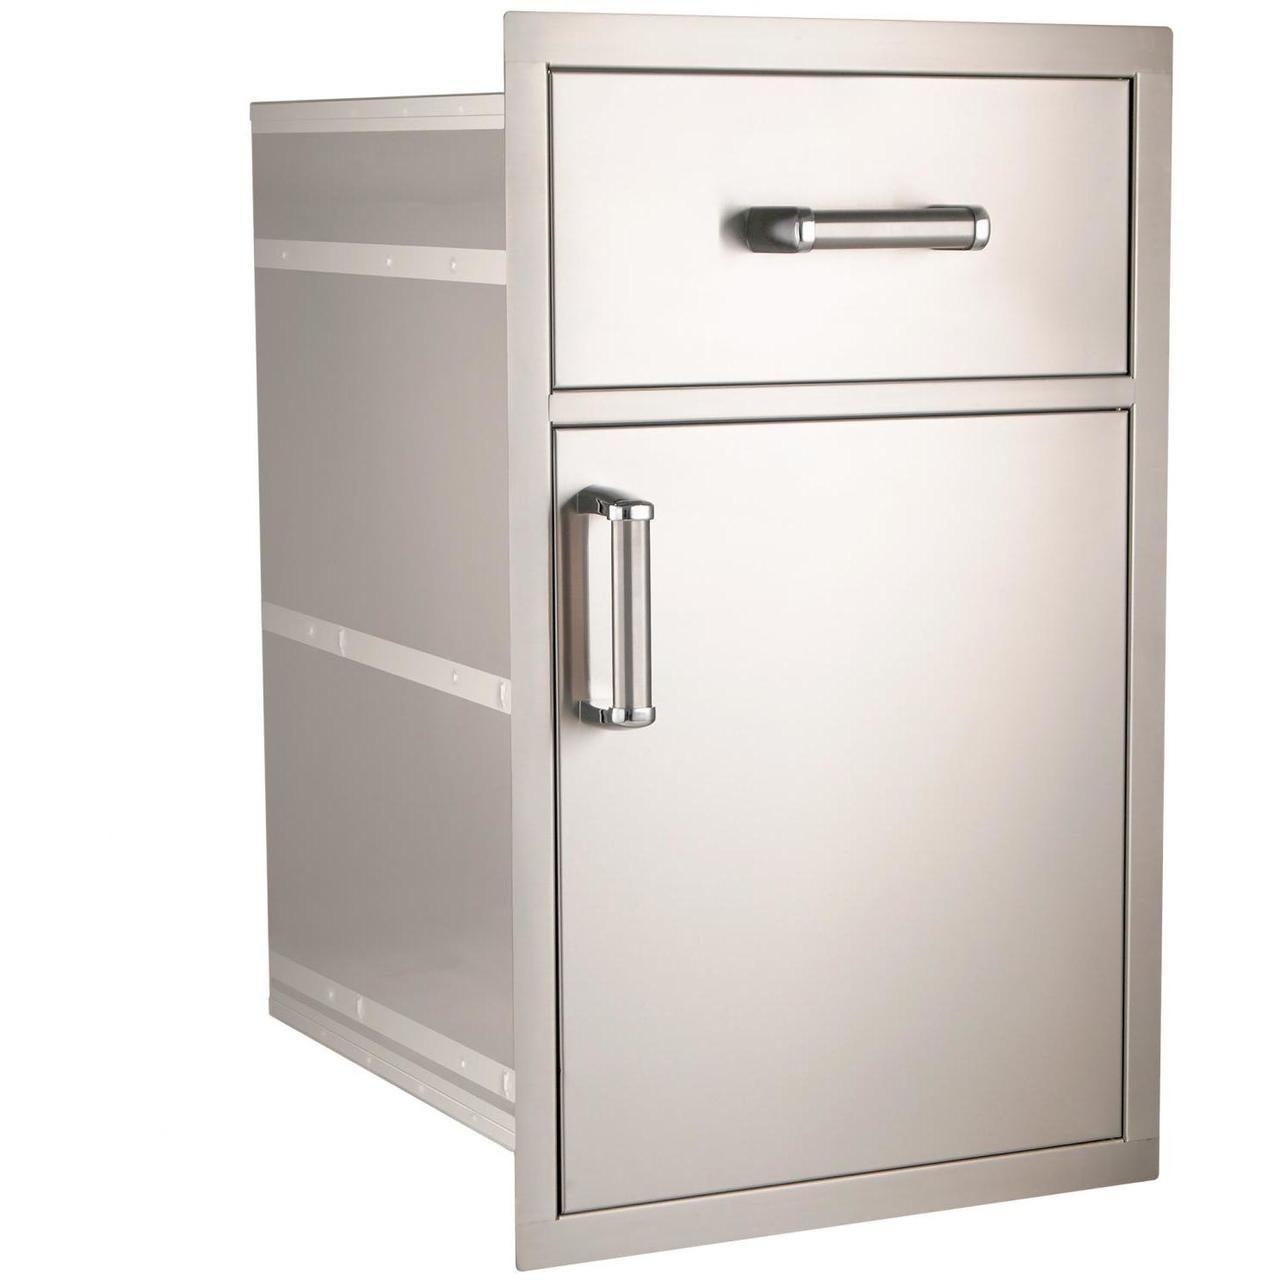 Fire magic premium flush 20inch pantry access drawer